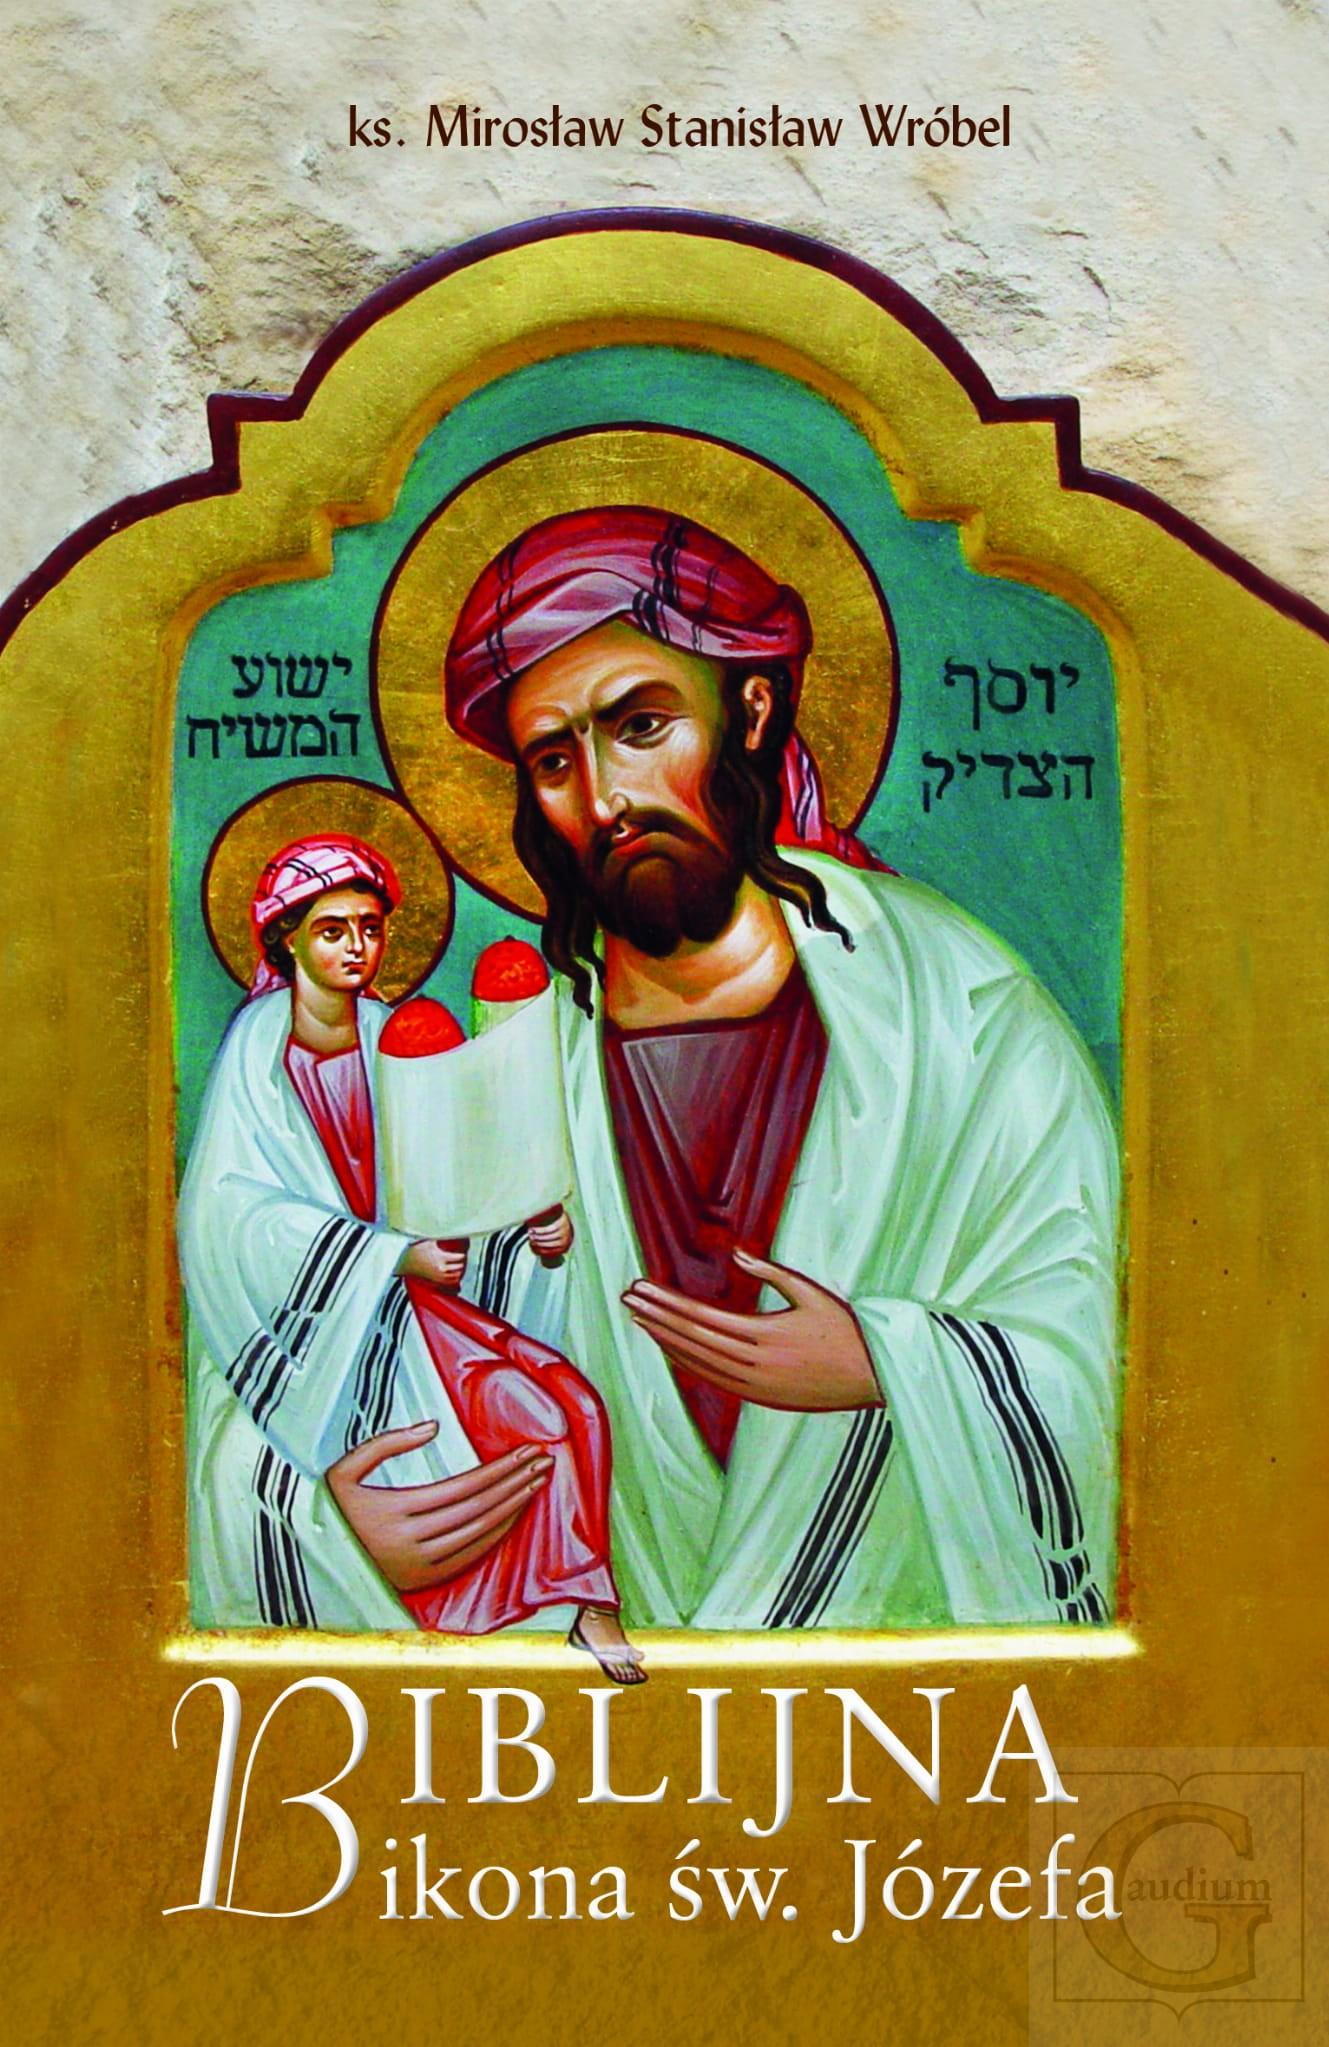 Biblijna ikona św. Józefa